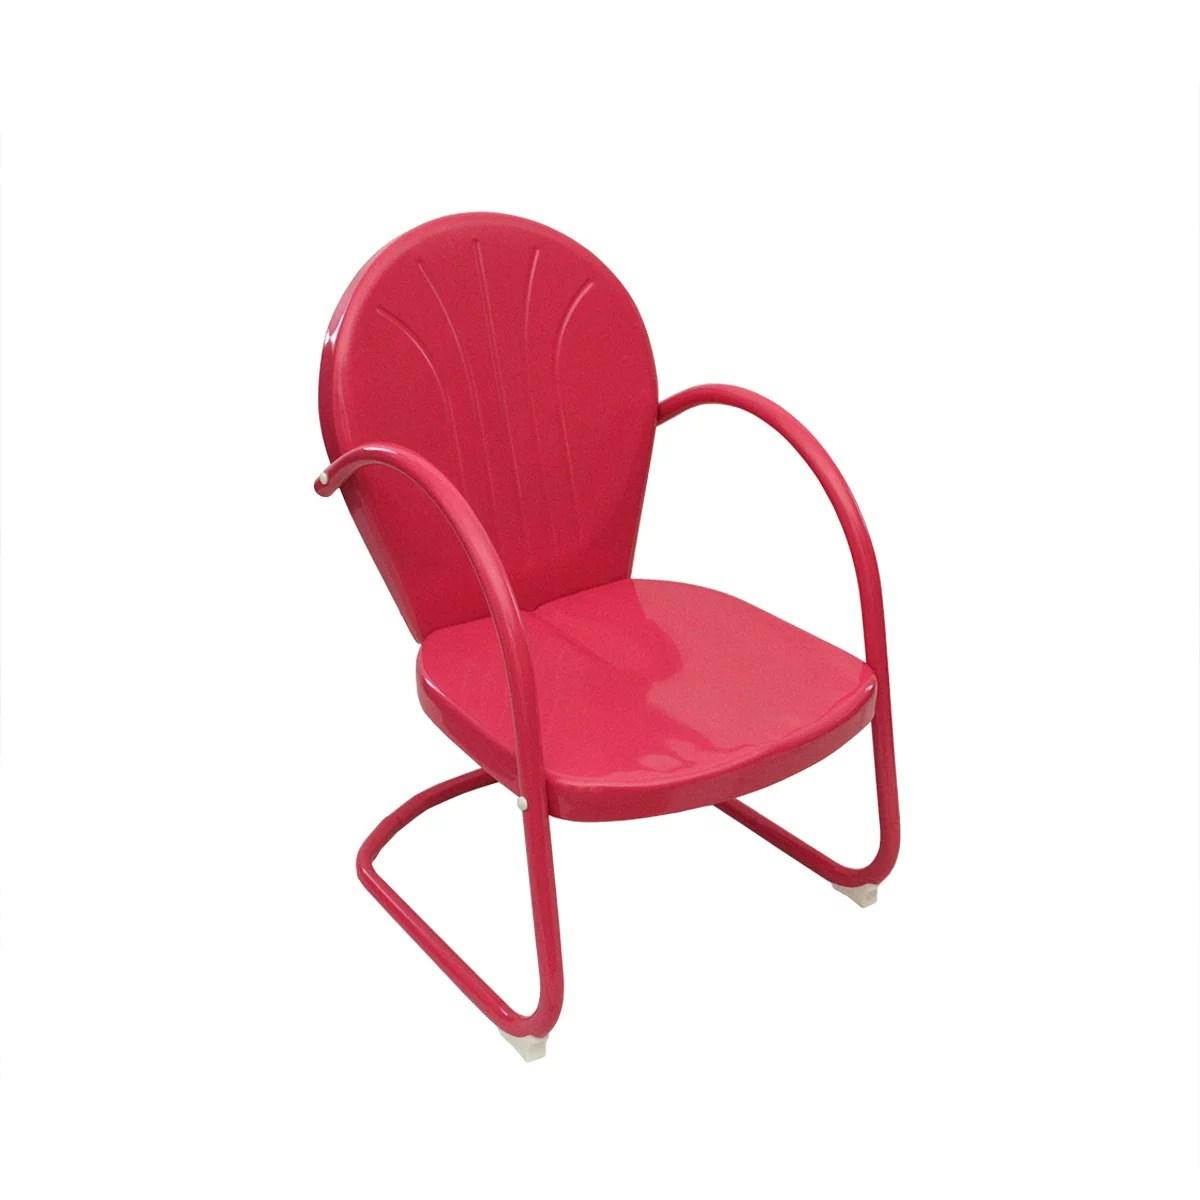 Pink Retro Metal Tulip Chair  Walmartcom